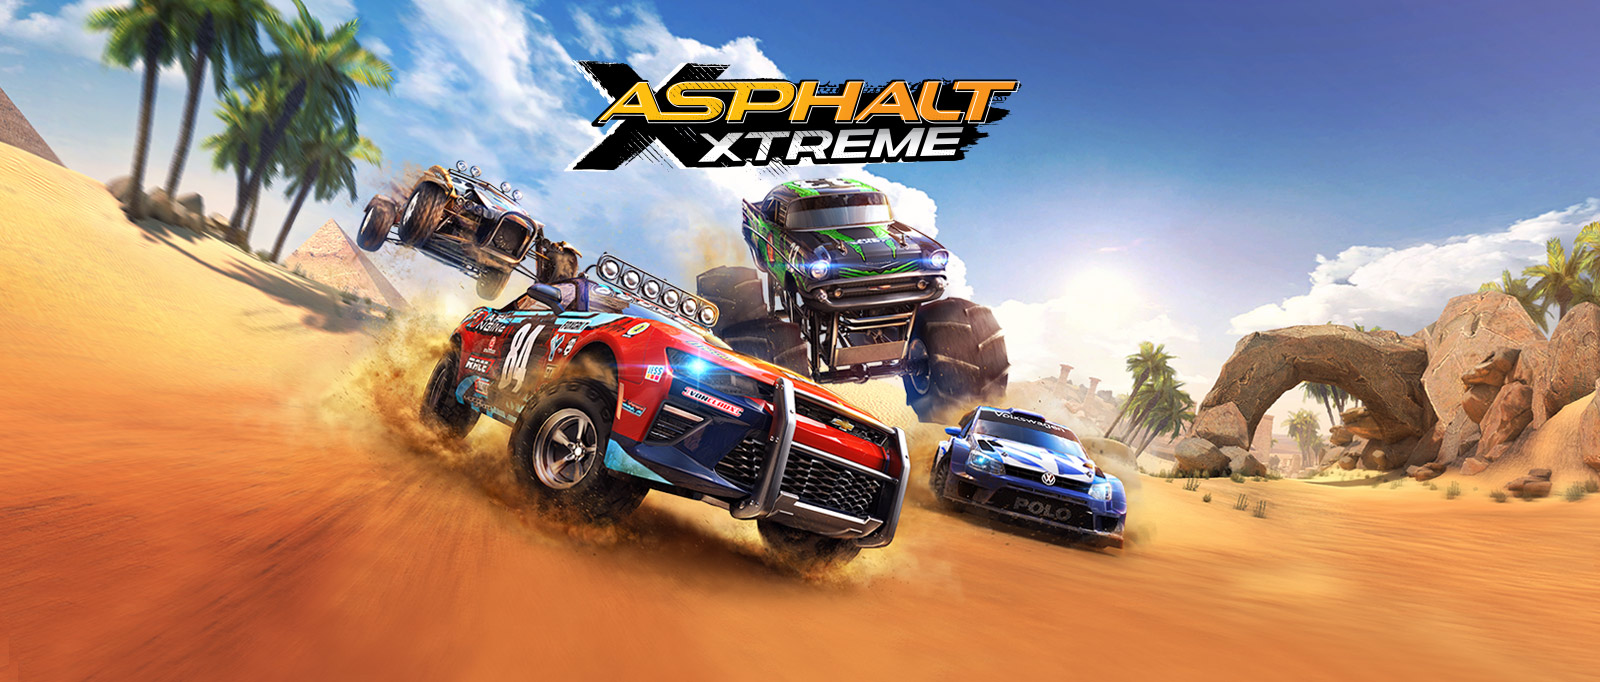 Asphalt 8 Wallpaper Cars Gameloft Asphalt Xtreme